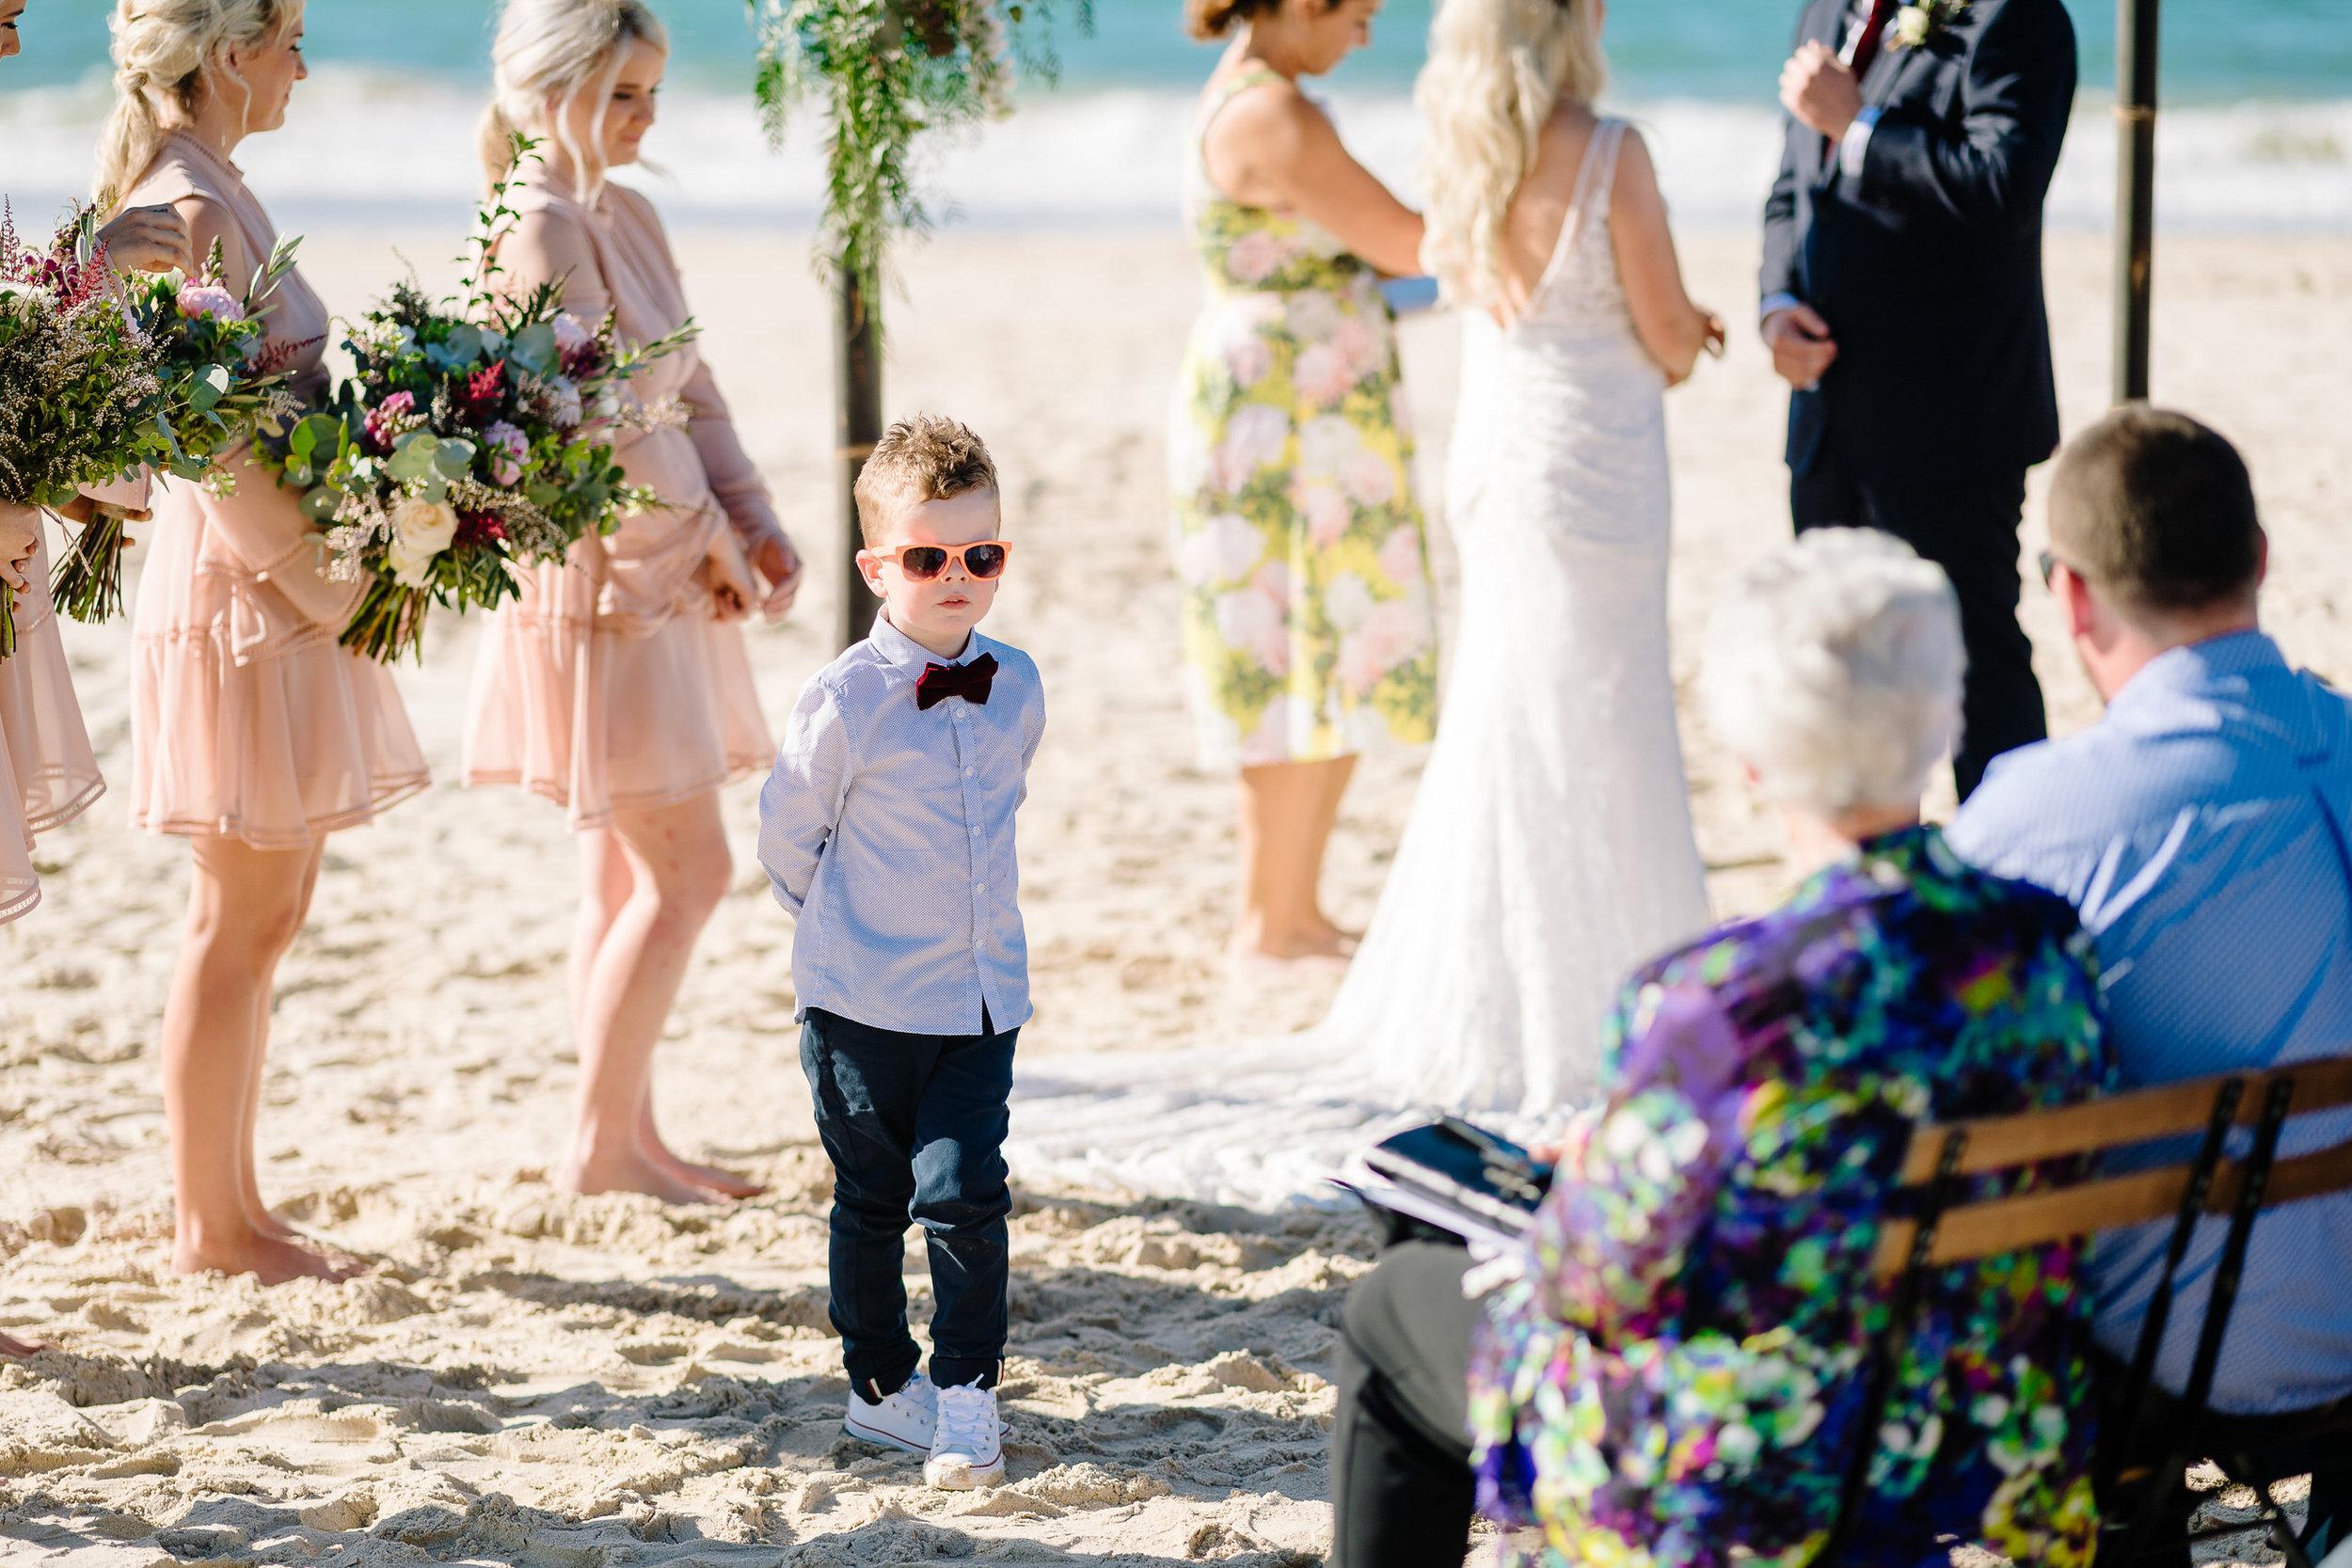 Justin_And_Jim_Photography_Byron_Bay_Wedding051.JPG